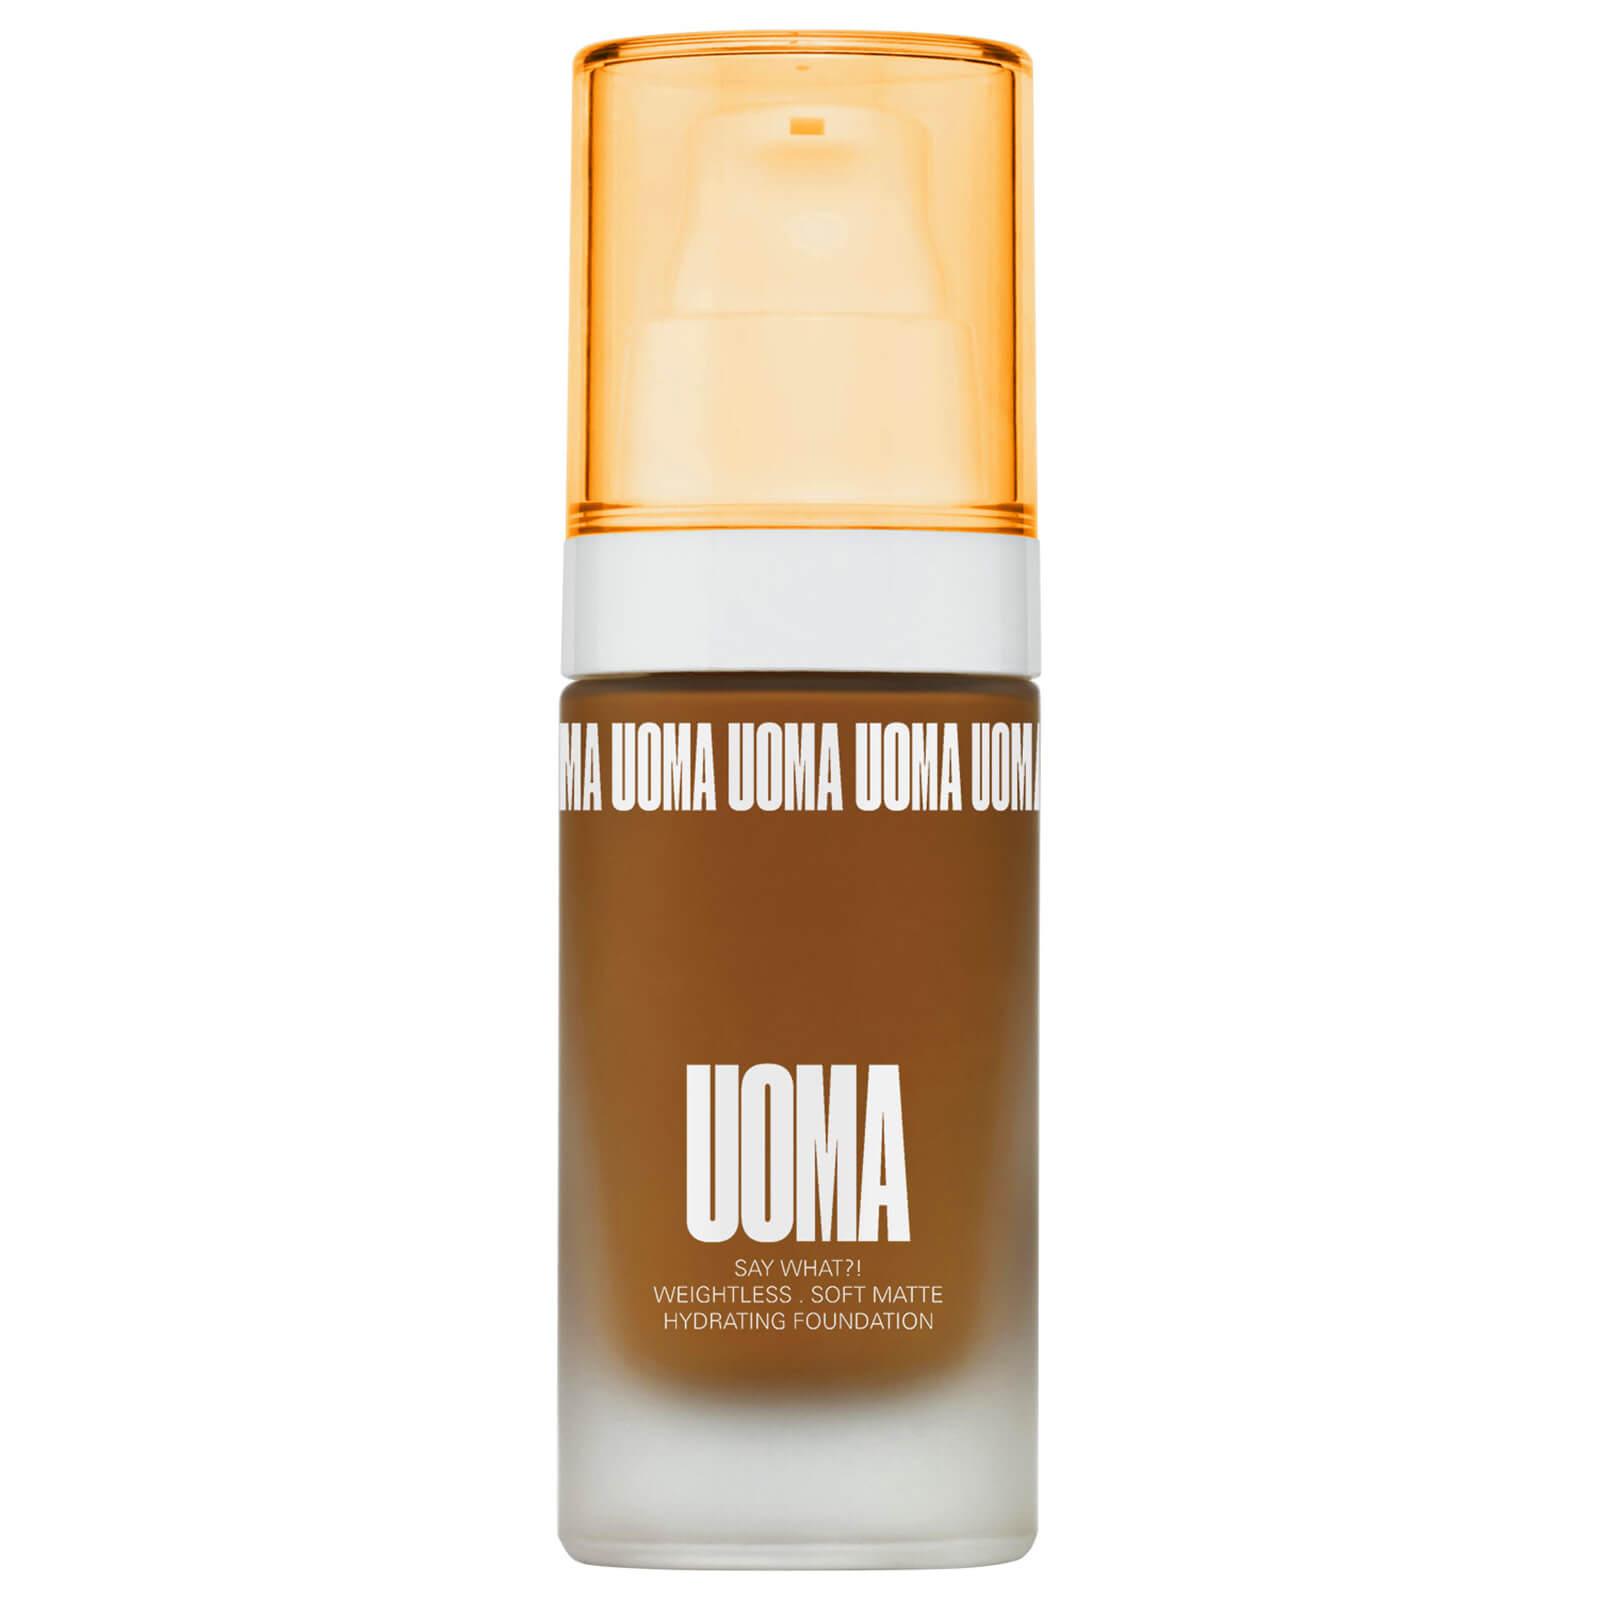 Купить UOMA Beauty Say What Foundation 30ml (Various Shades) - Brown Sugar T3W